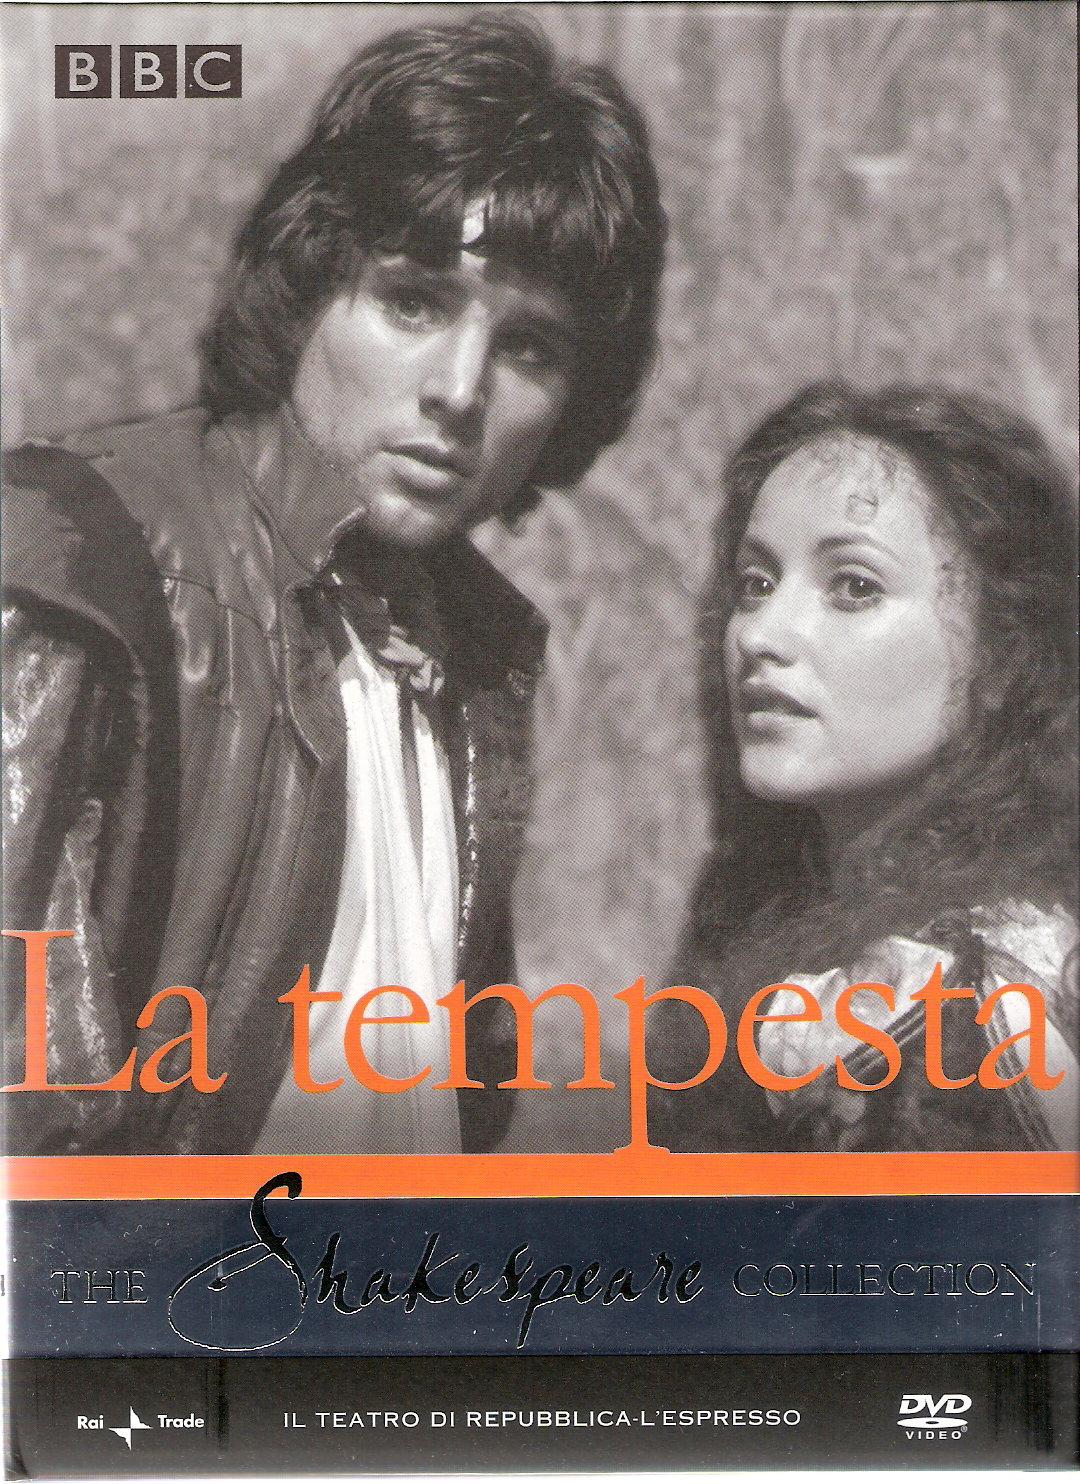 Shakespeare Collection 13, The: La tempesta - HOMEVIDEO